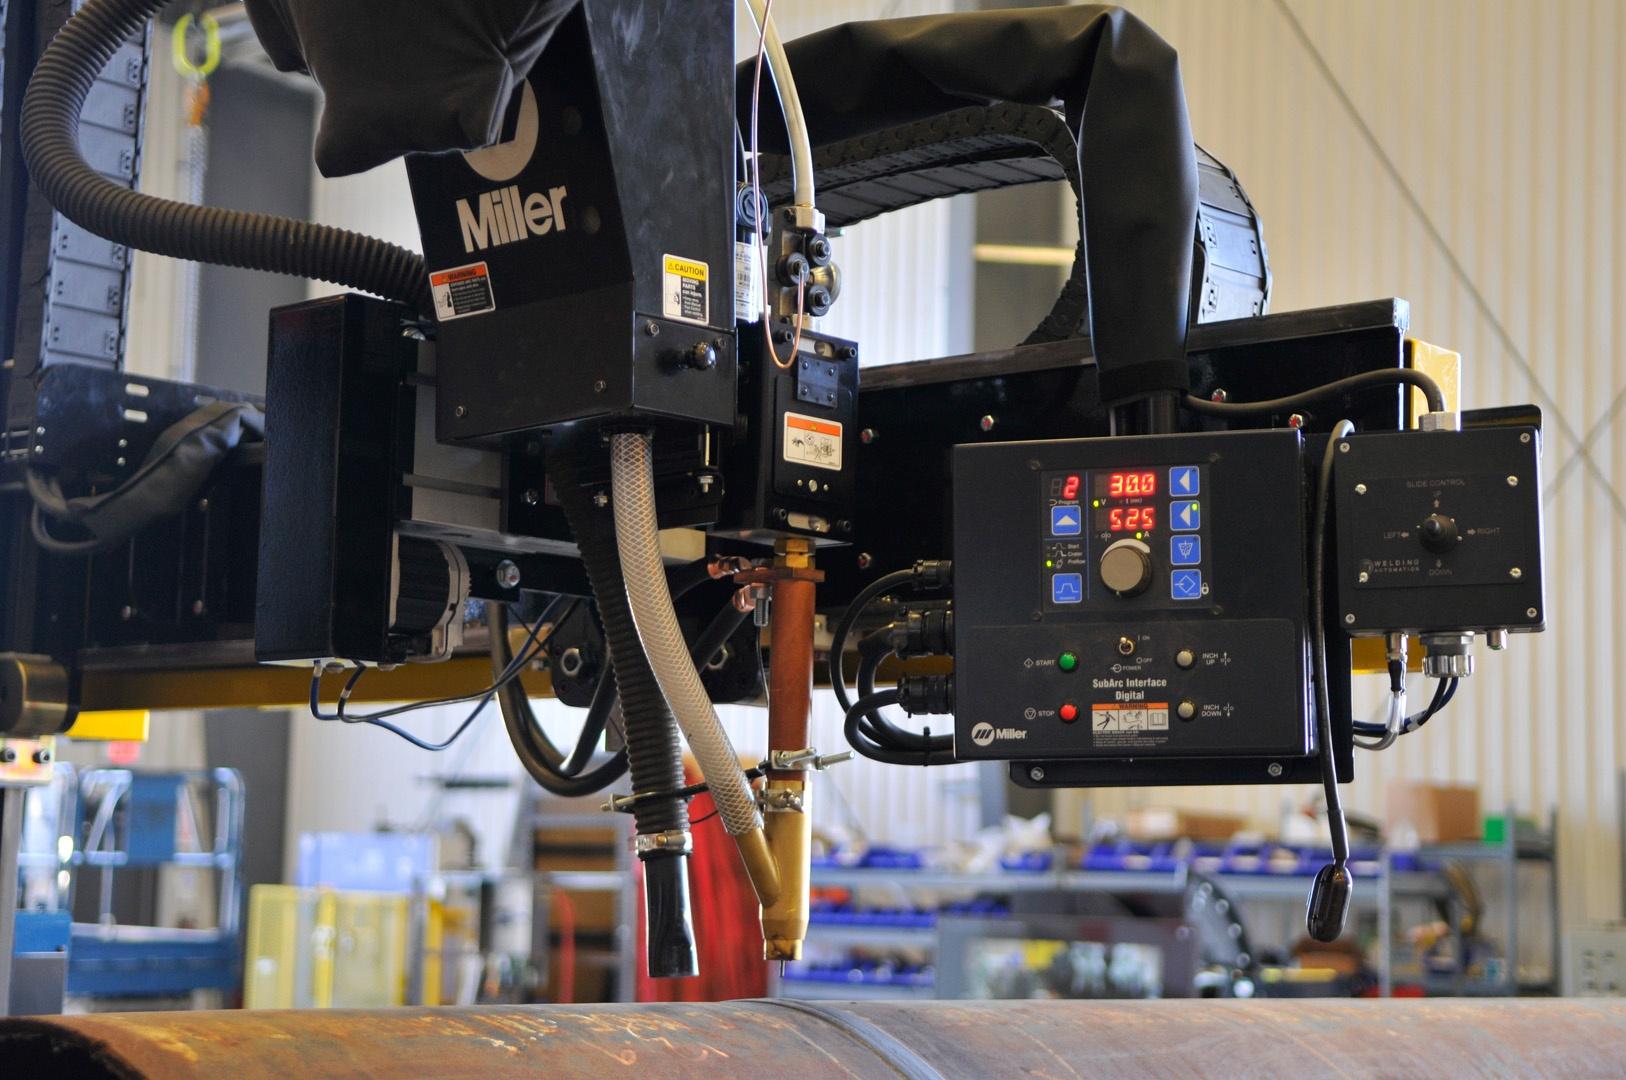 miller boom mounted controls for C&B manipulator.